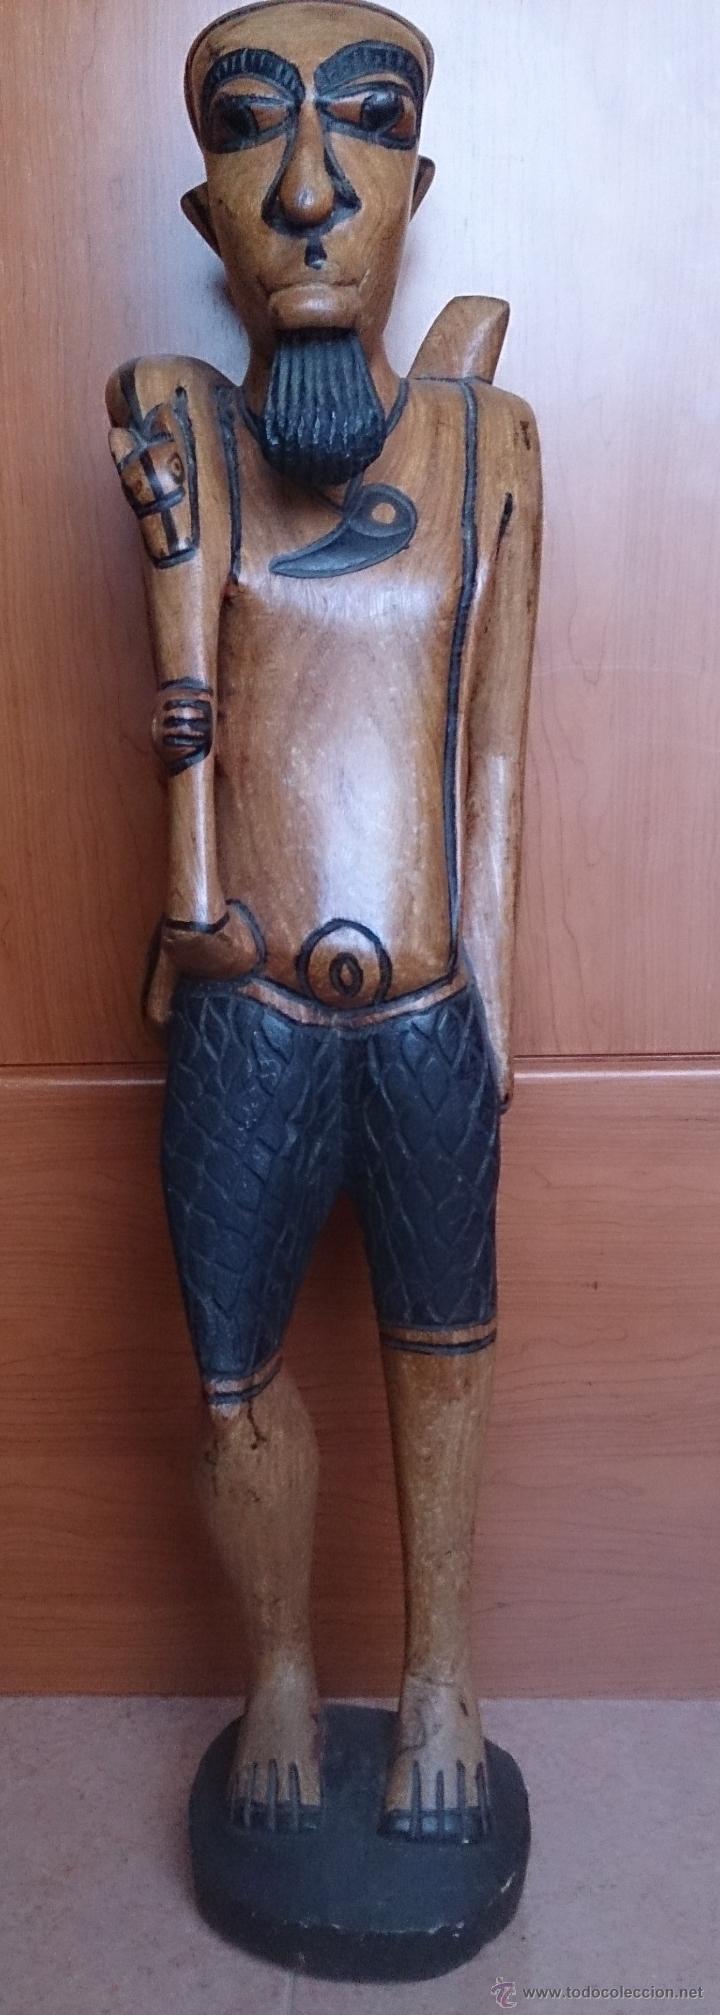 Arte: Gran talla indígena en madera maciza ( 91,5 CM DE ALTO ) . - Foto 22 - 43242684